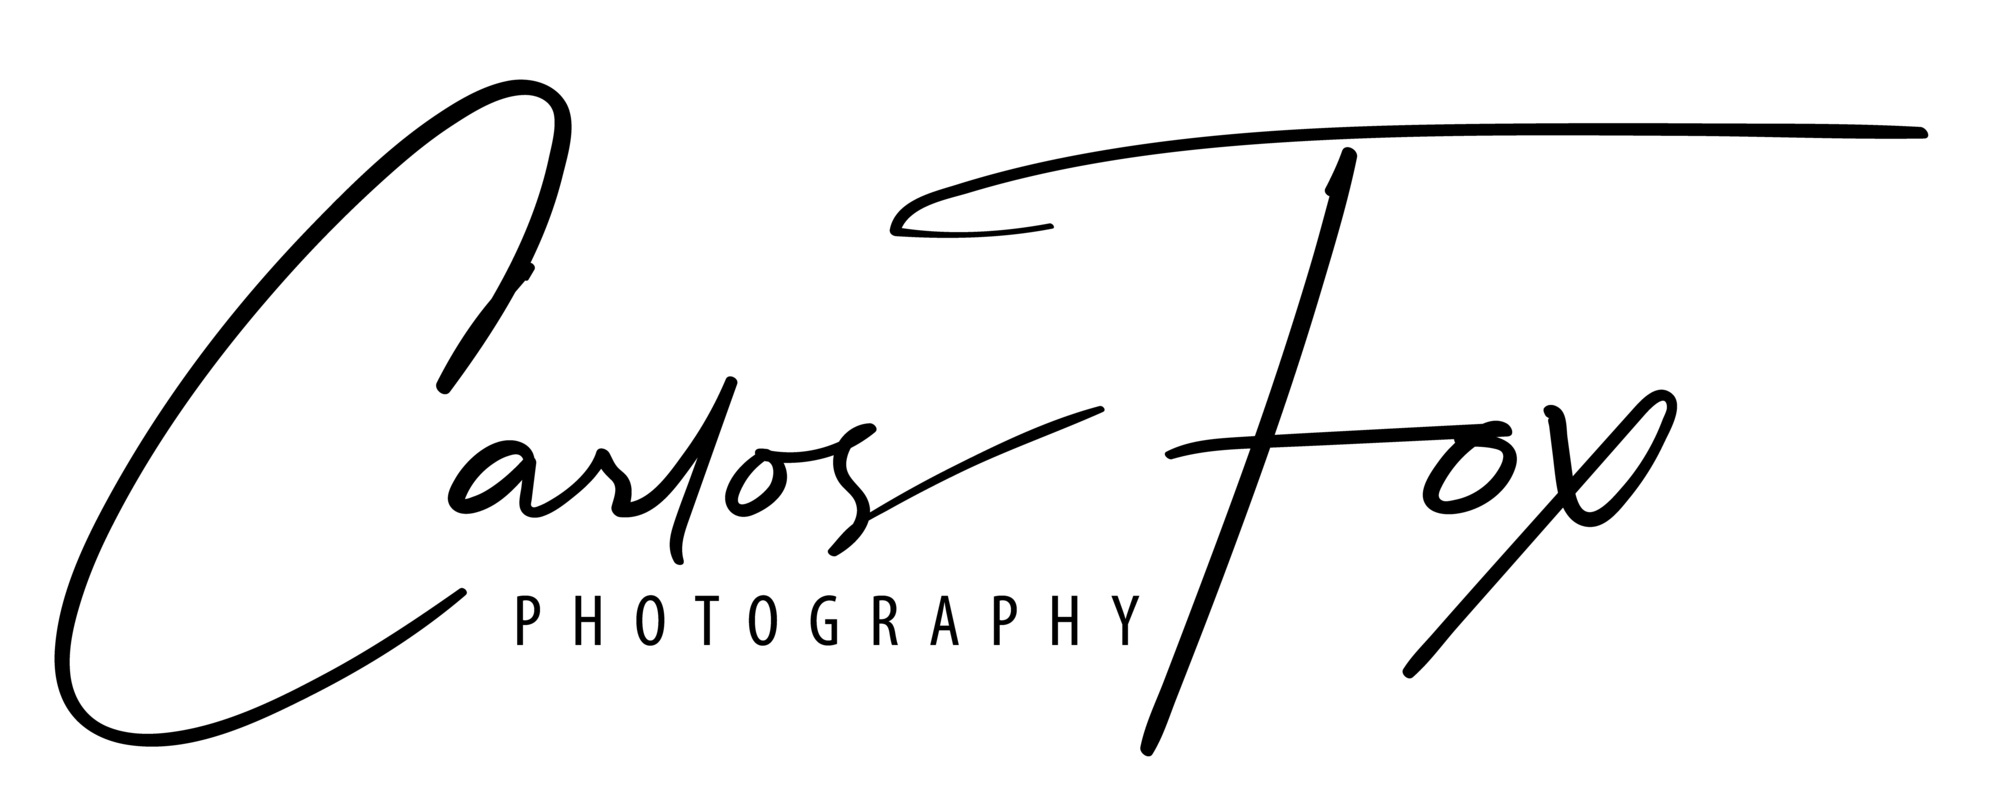 Carlos-Fox-black-hiRes.jpg